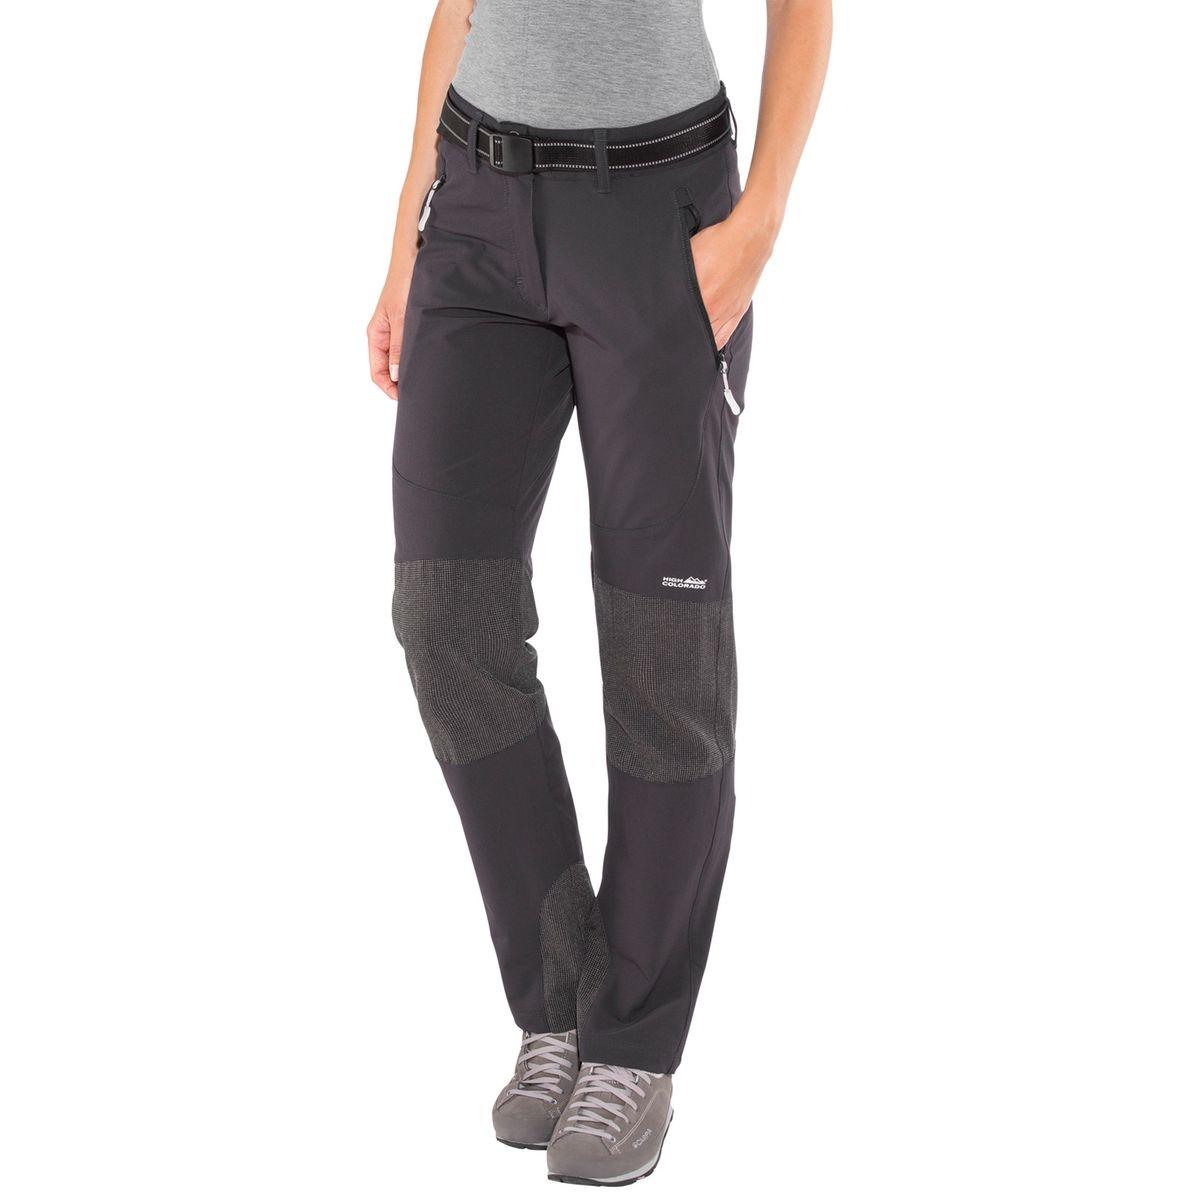 Spitzing - Pantalon Femme - gris/noir